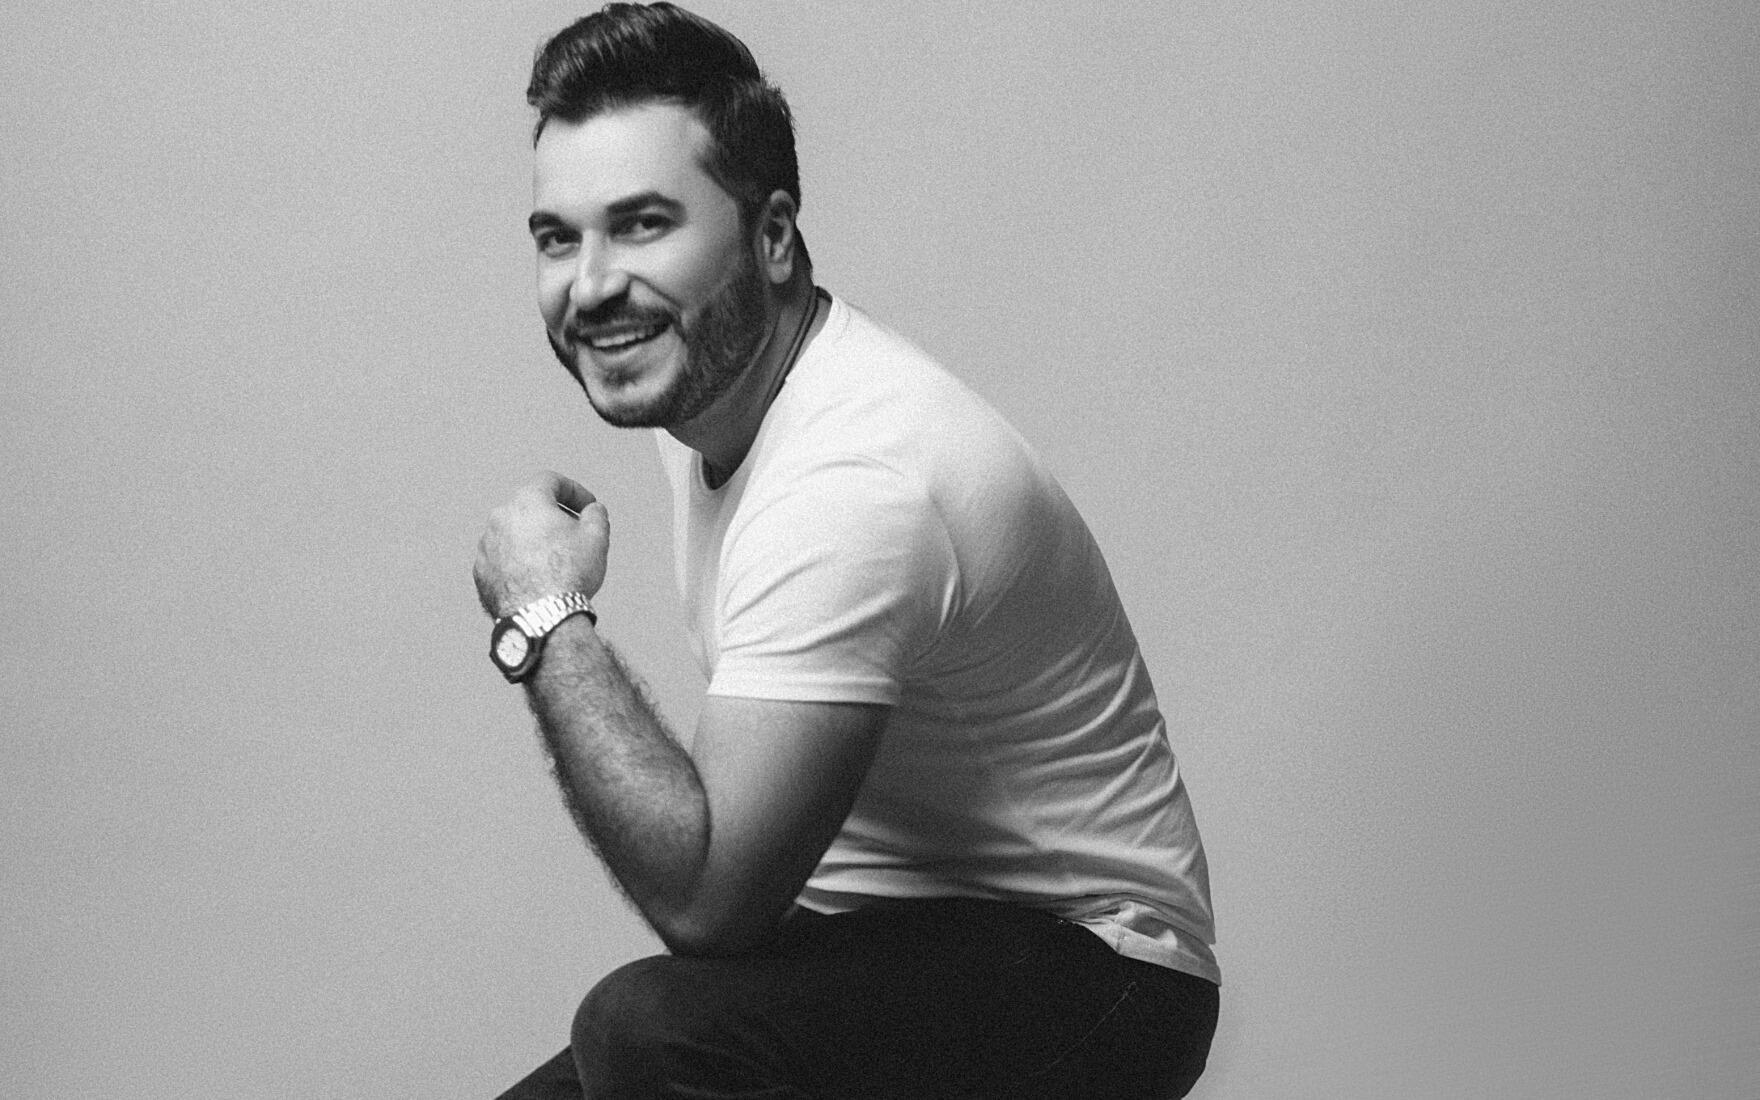 دانلود آهنگ اذربایجانی 2020 از Elvin Abdullayev – Röyamdasan